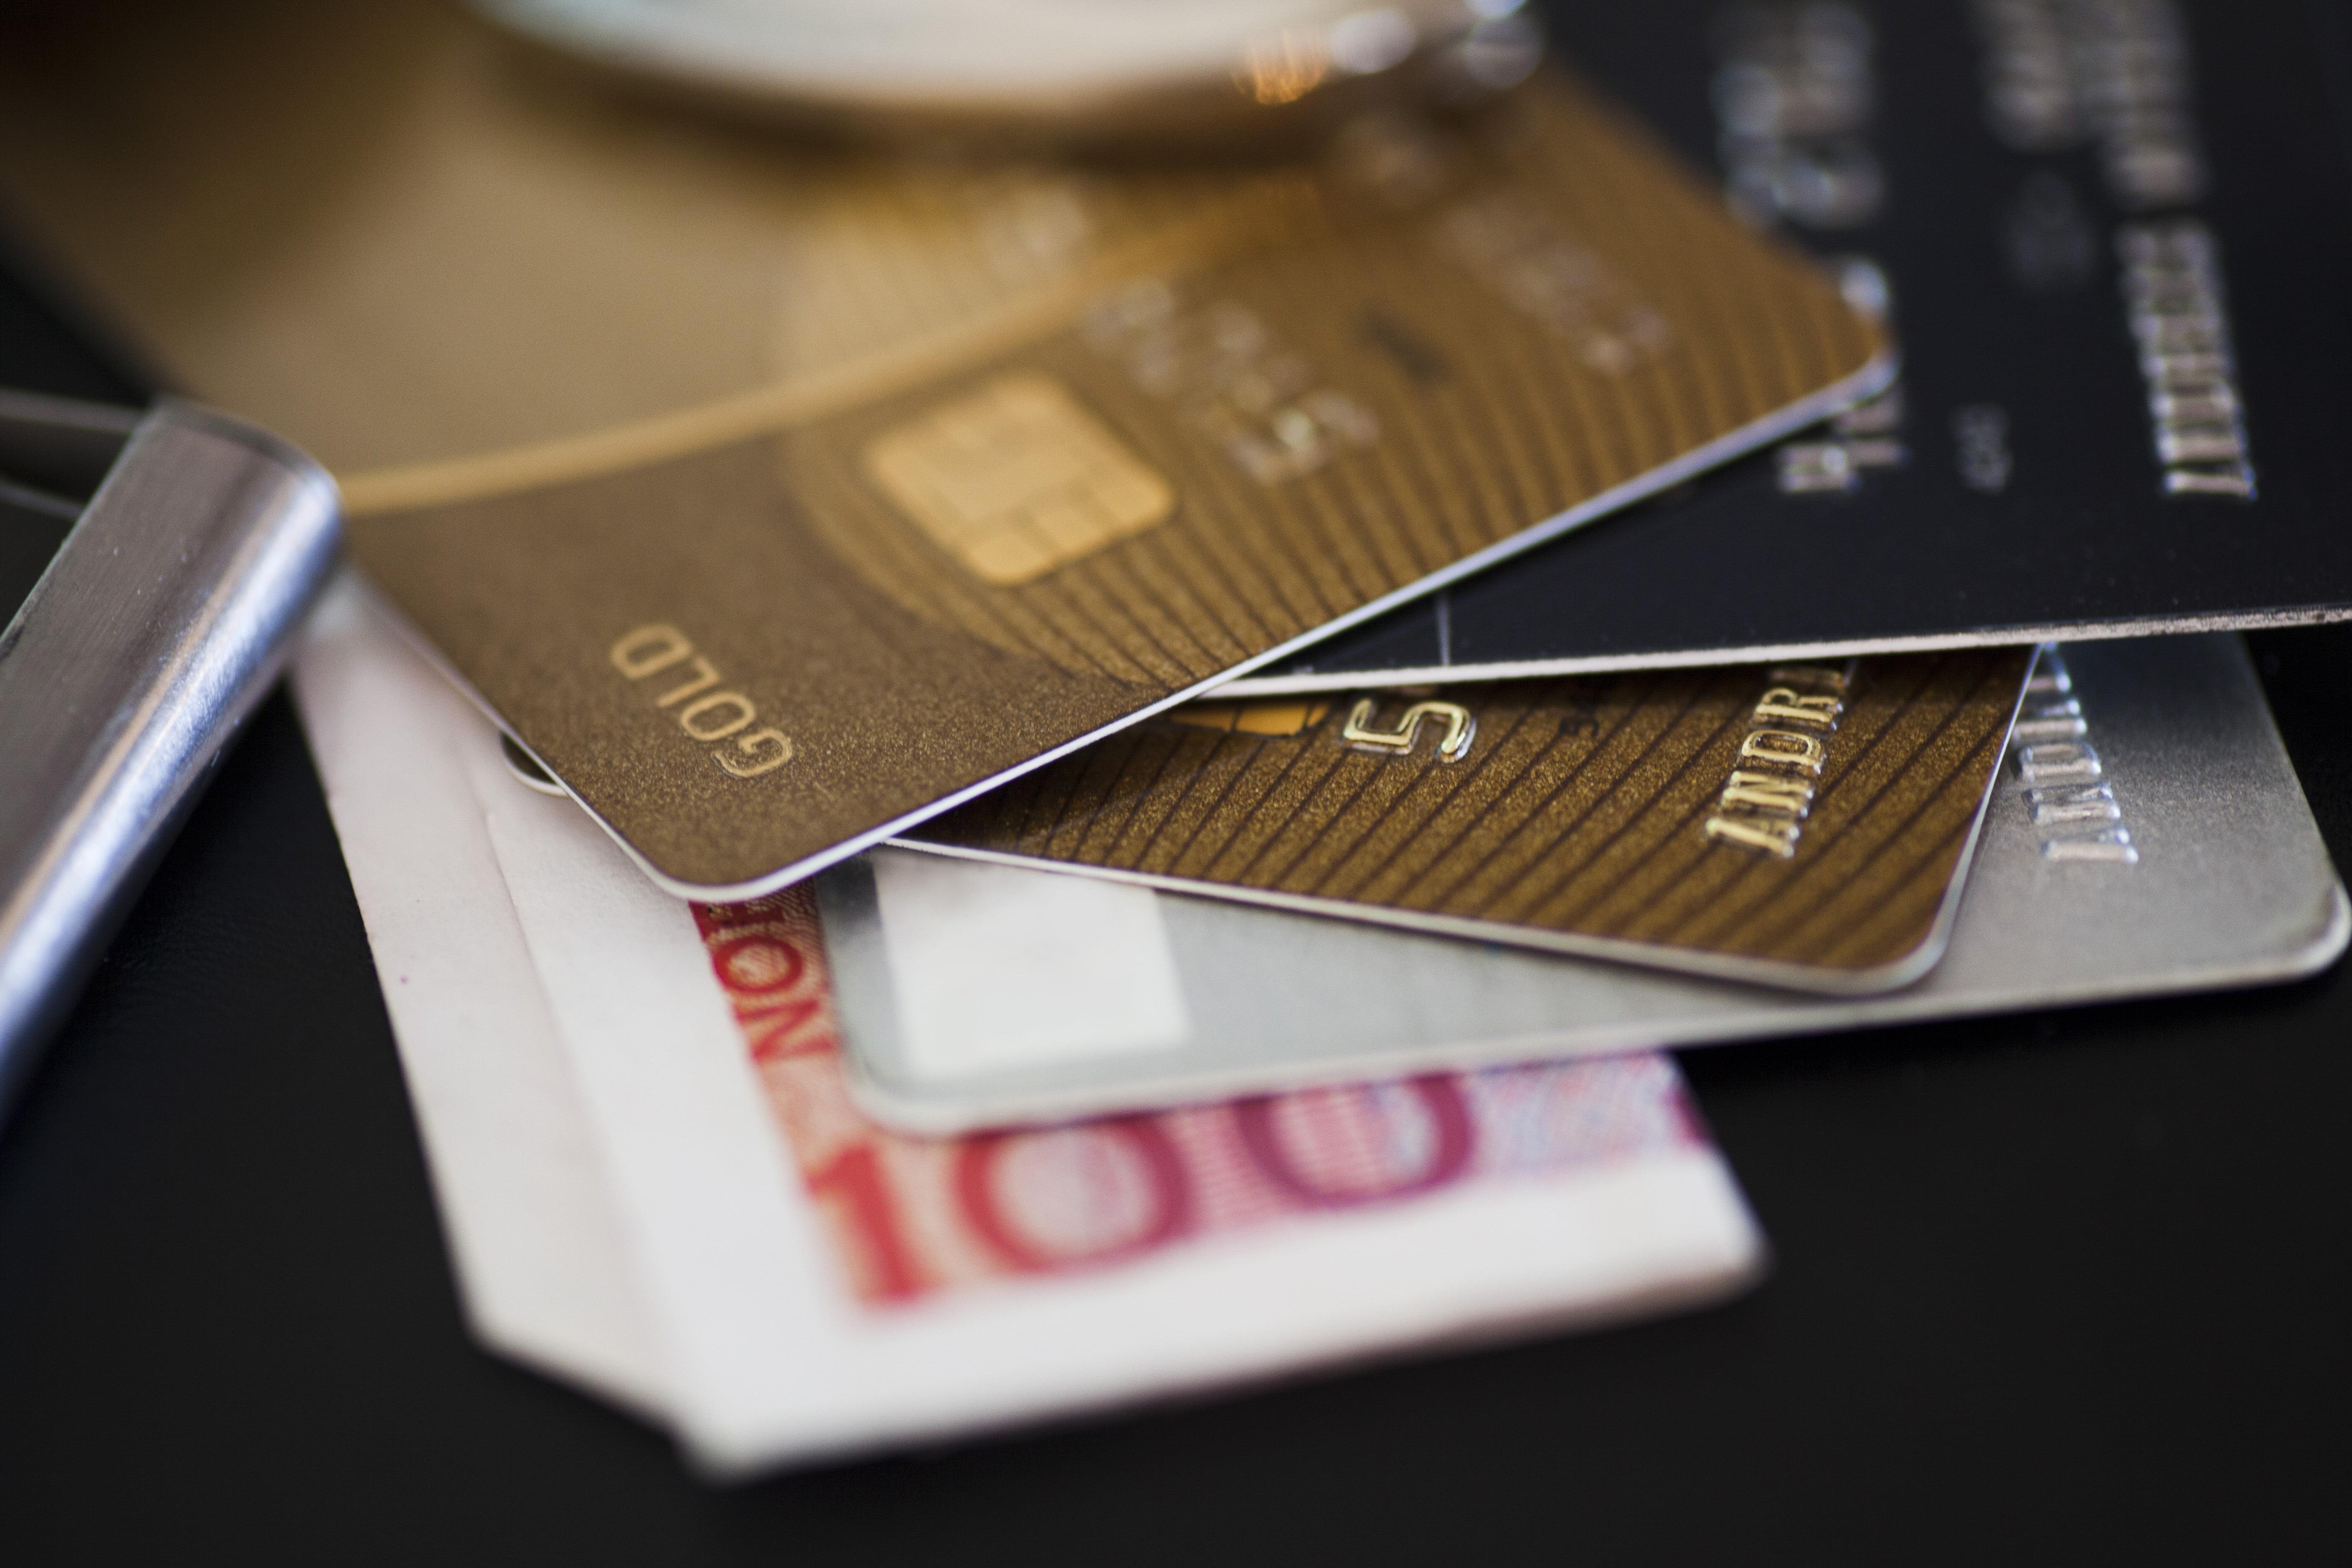 bitcoin debit card, bitcoin payments, bitcoin atm